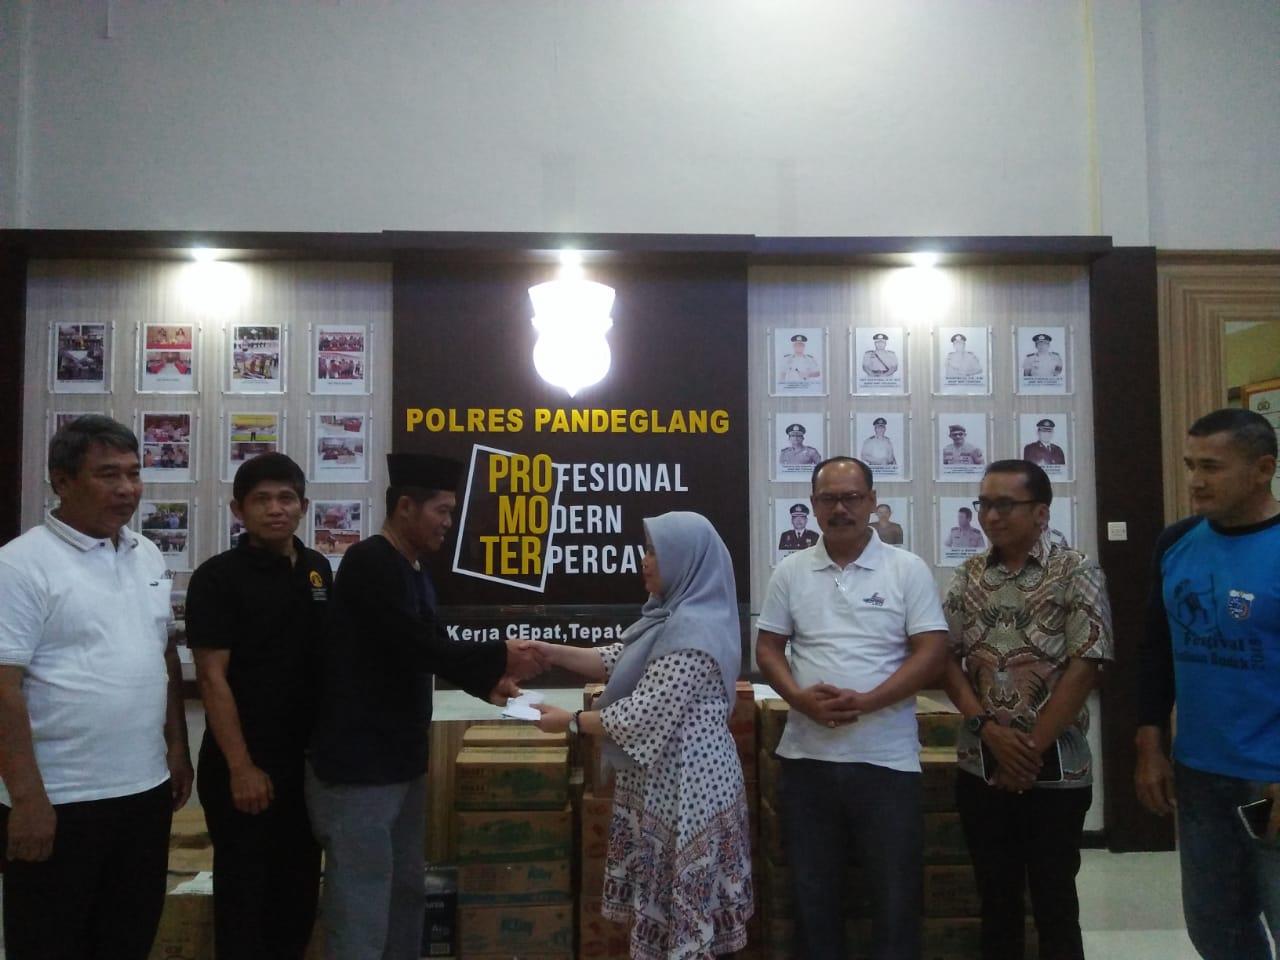 Asosiasi HRD-GA Karawang Salurkan Bantuan kepada Korban Tsunami di Pandeglang